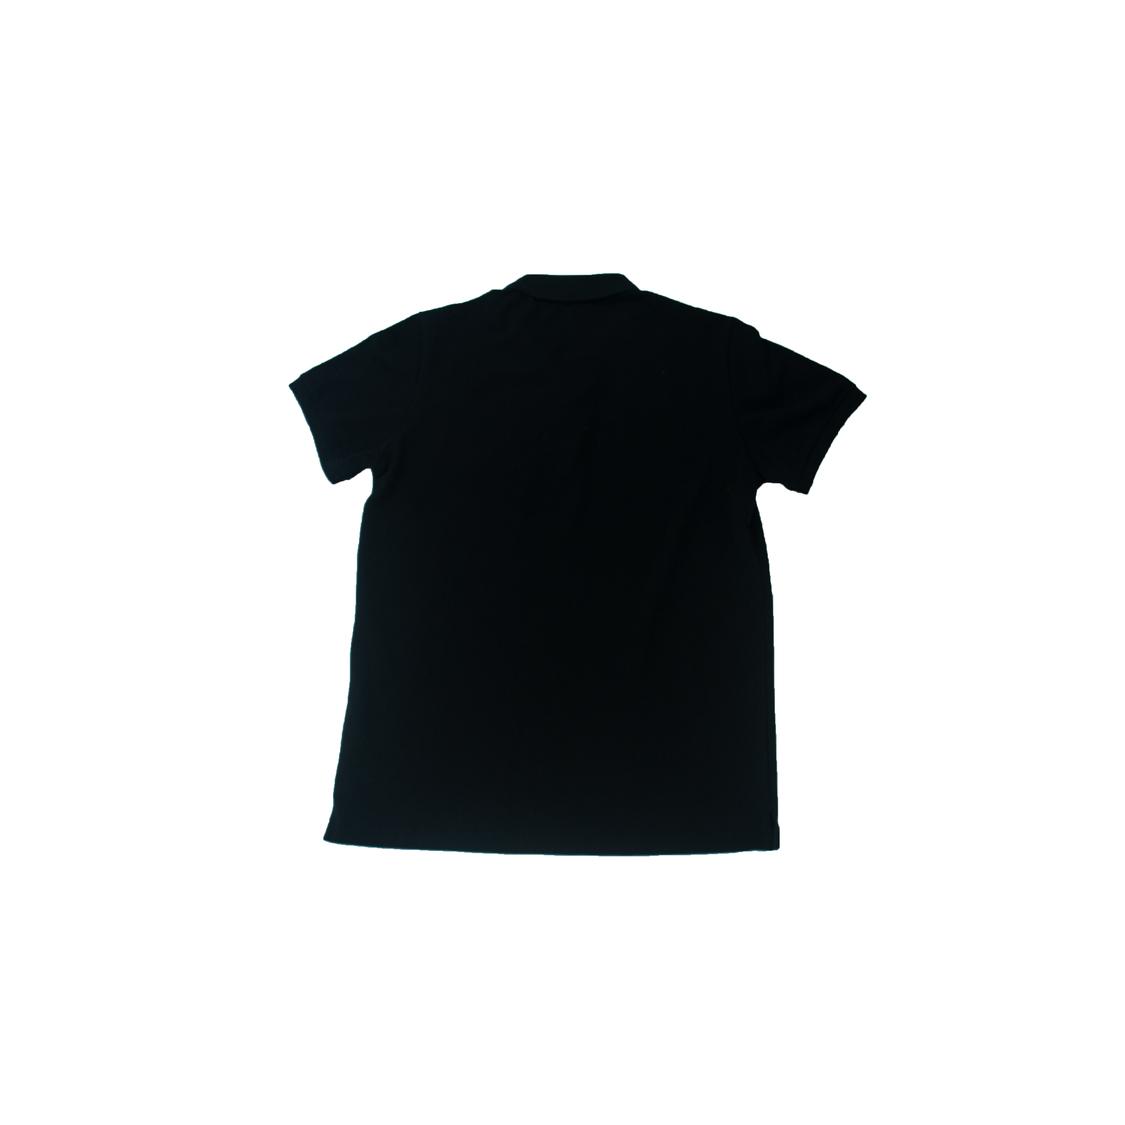 Áo Polo Givenchy Paris thêu ngực - Đen